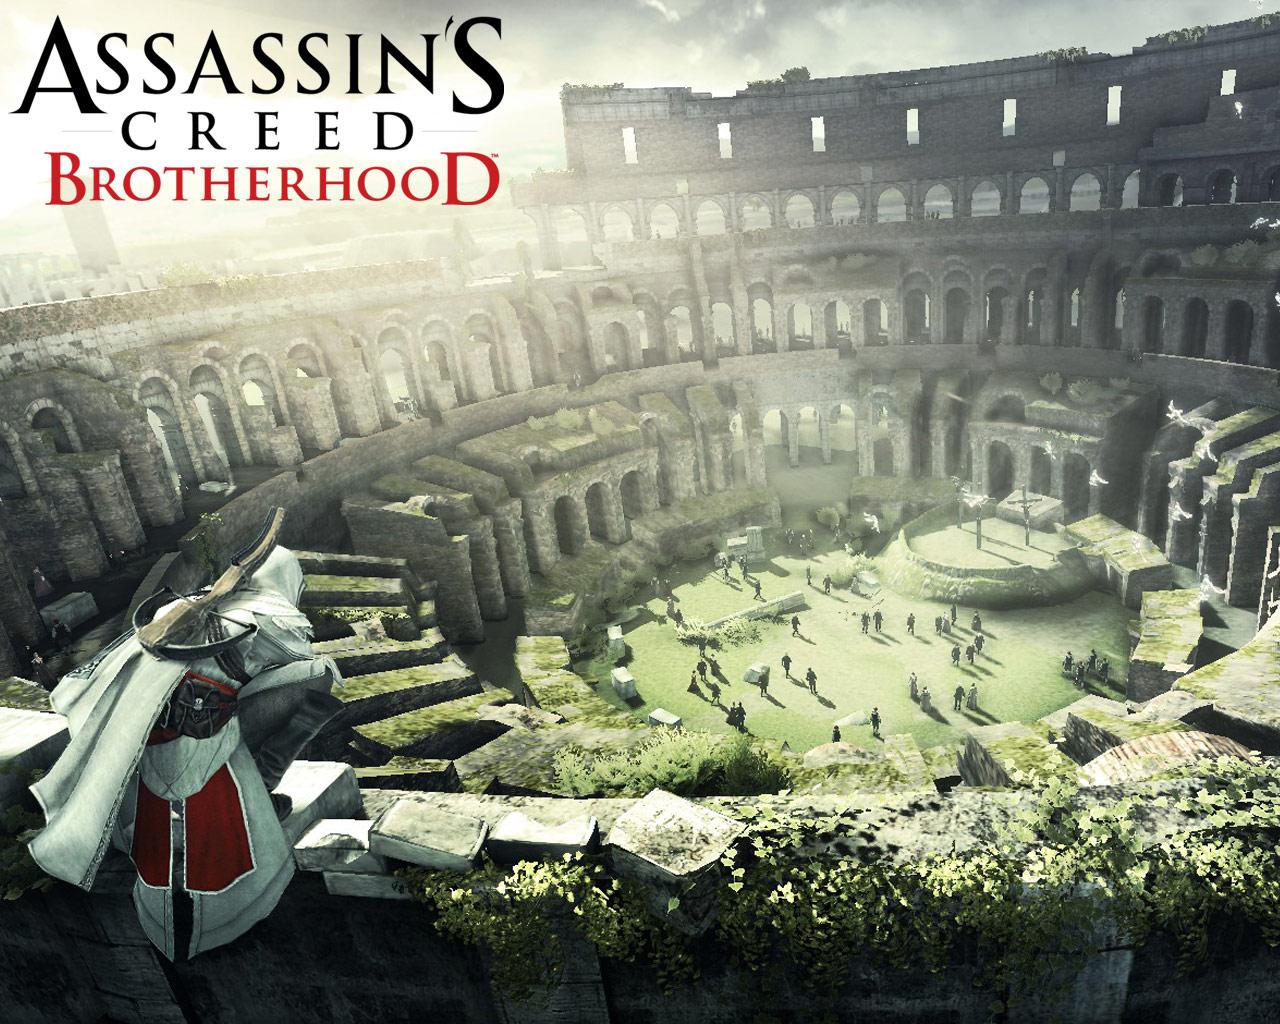 http://1.bp.blogspot.com/_TUe_MU8PcGw/TFtkUJ9jgEI/AAAAAAAAAAk/xfGNmqnSJqU/s1600/assassins+creed+wallpaper_2.jpg